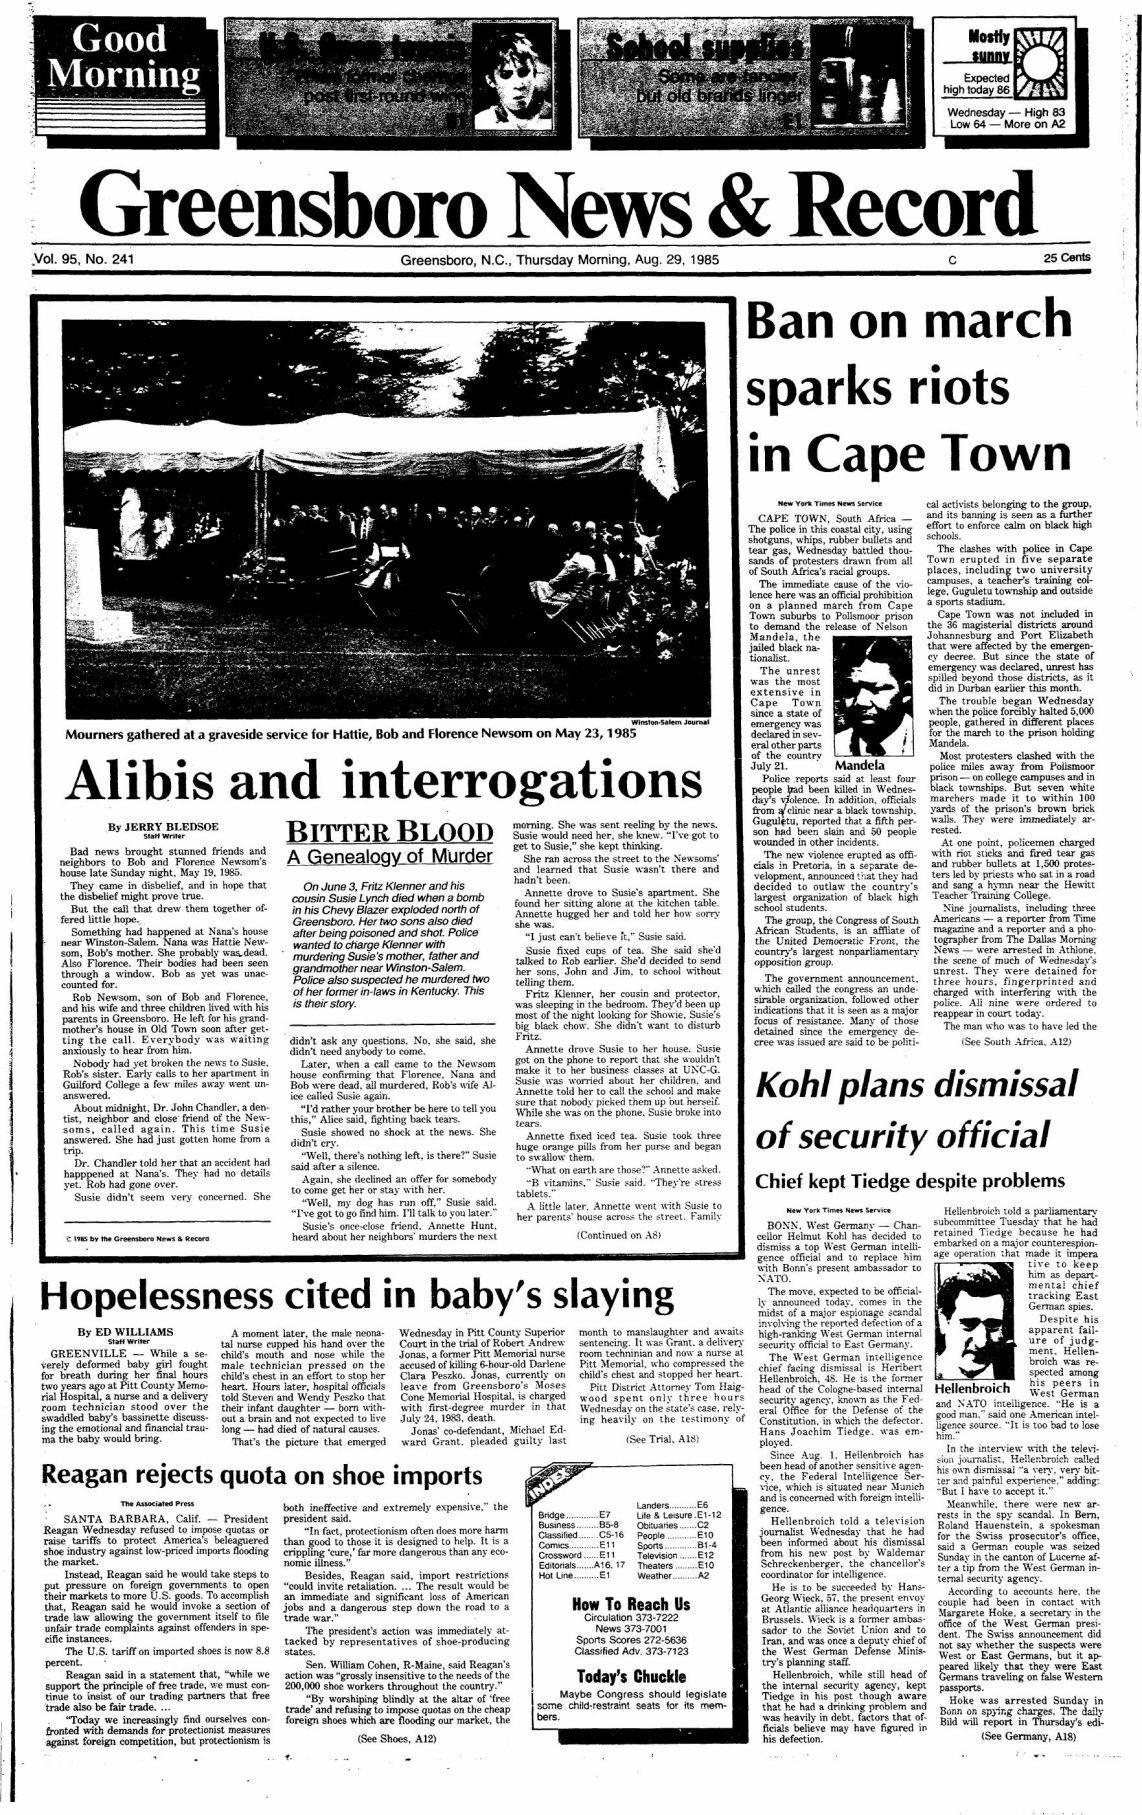 Bitter Blood: Alibis and interrogations